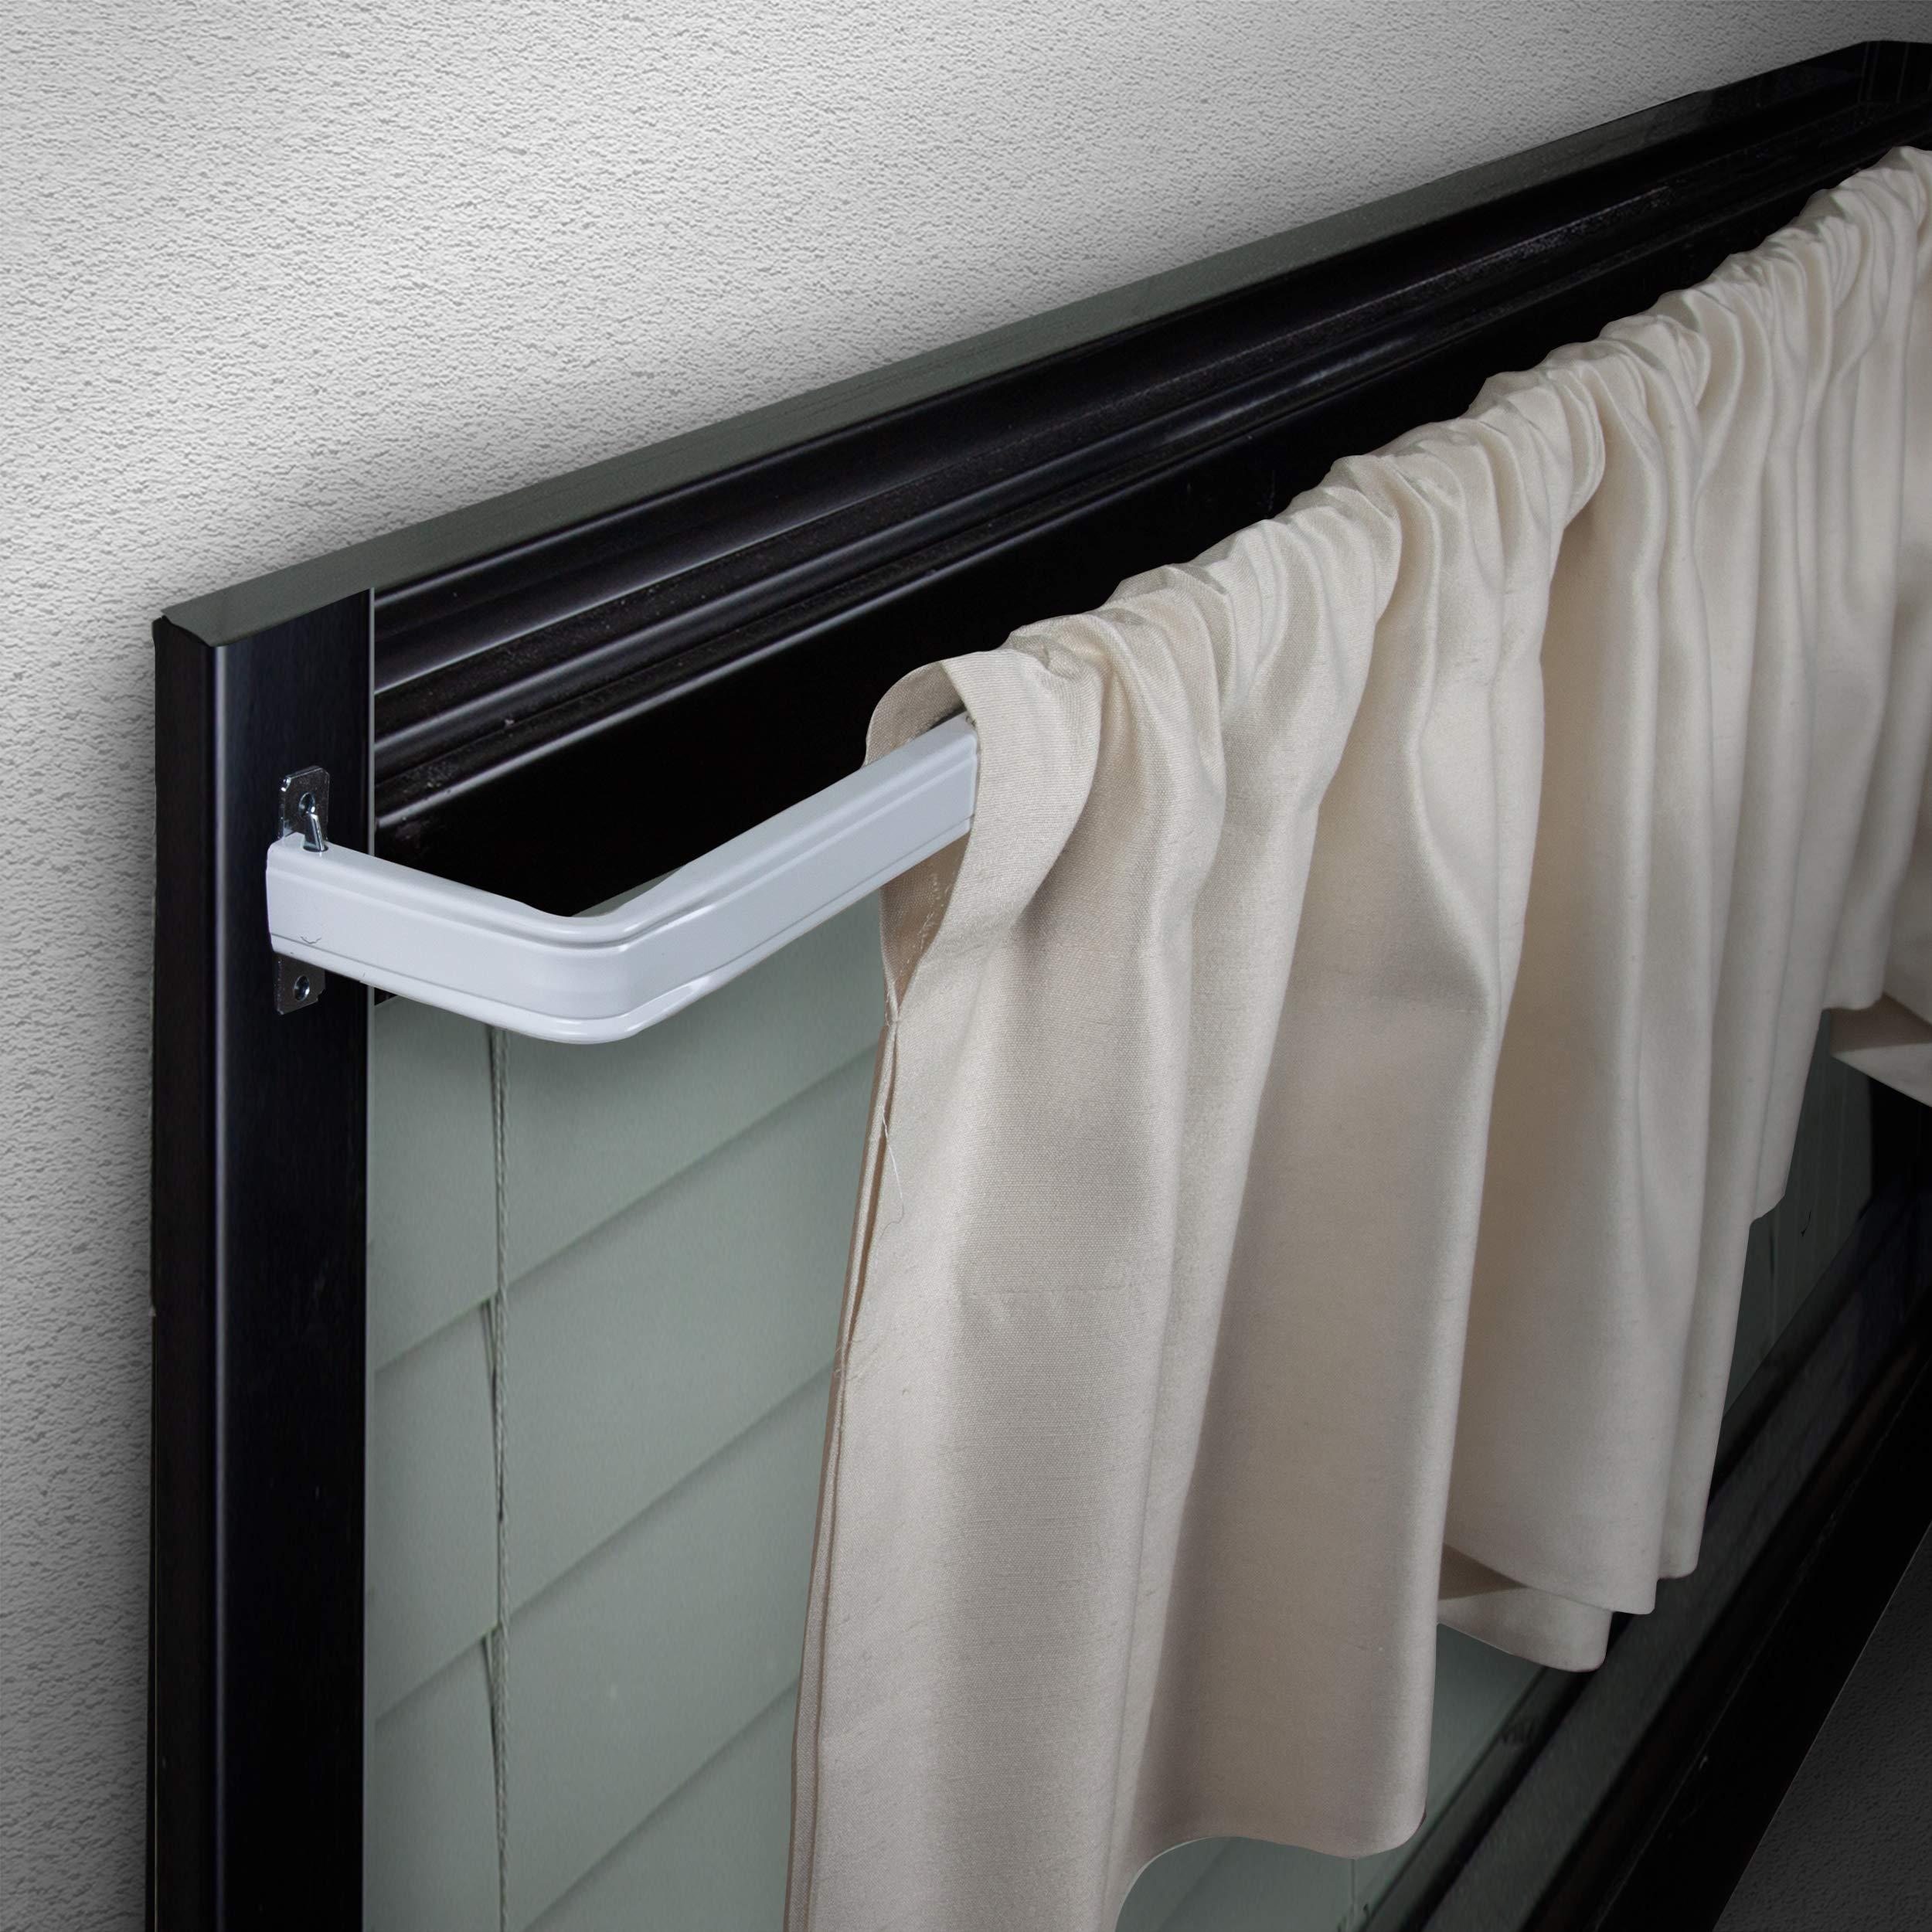 "Rod Desyne Lockseam 3"" Curtain Rod, 48-84 inch, White"